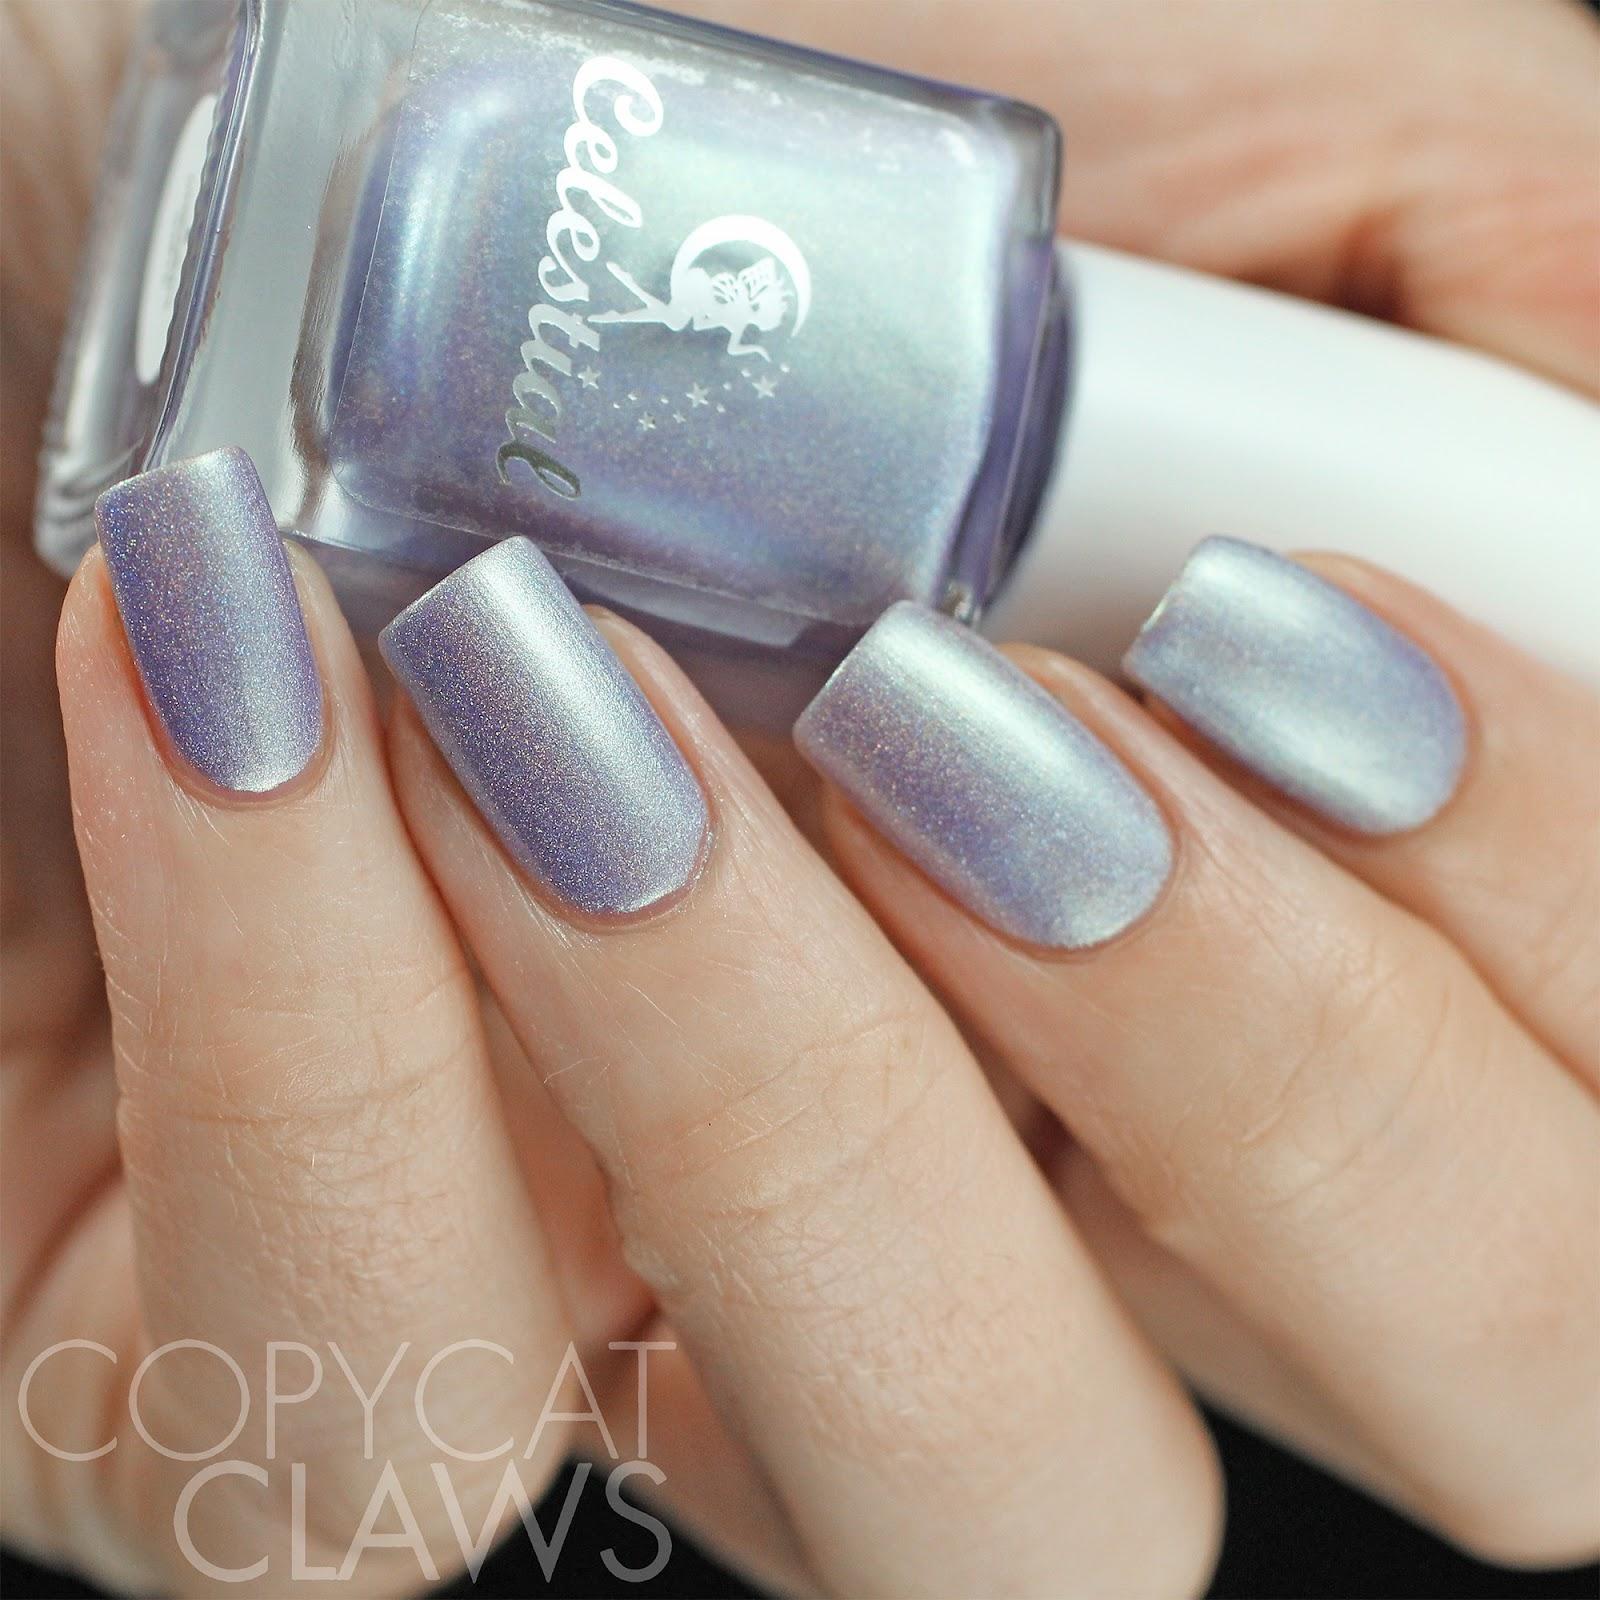 Copycat Claws: Celestial Cosmetics Rainbows & Unicorns